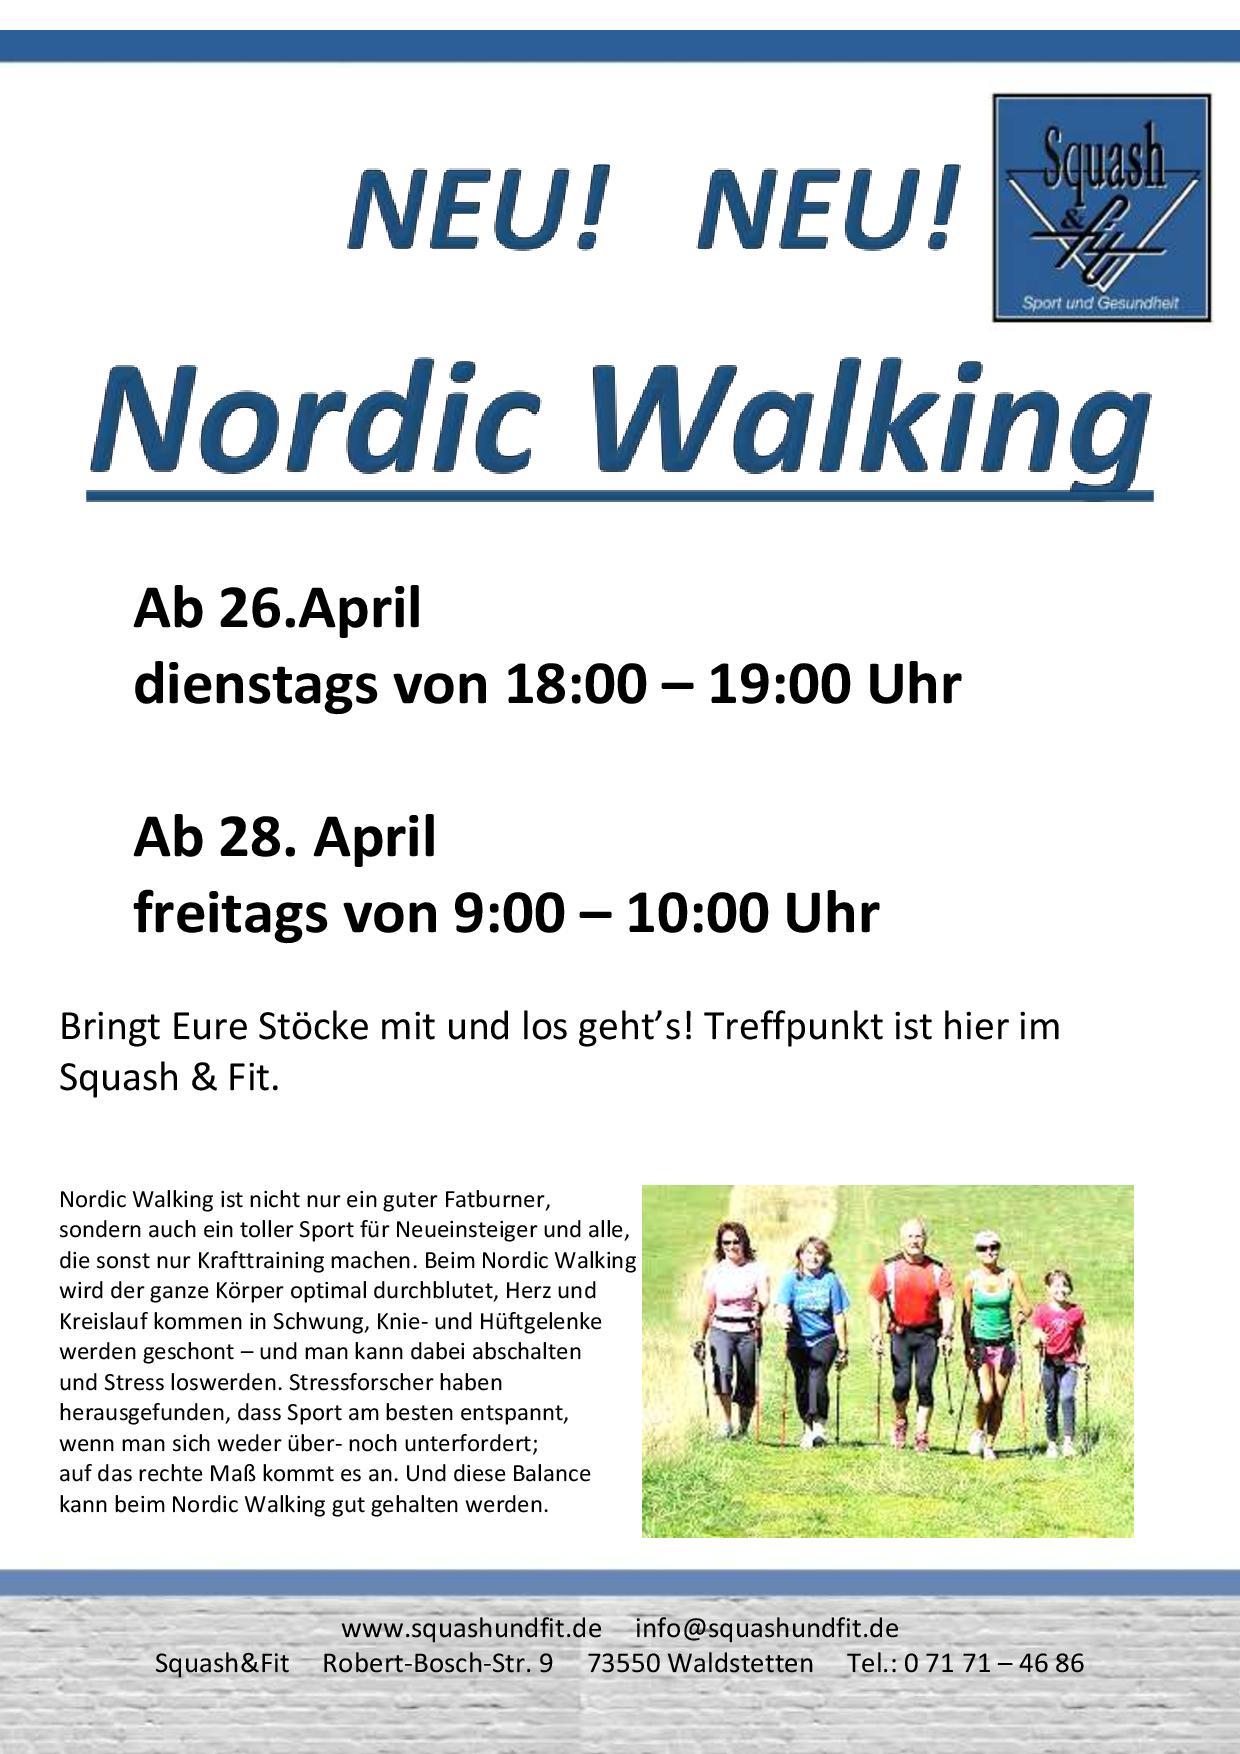 NordicWalkingA4hoch-page-001